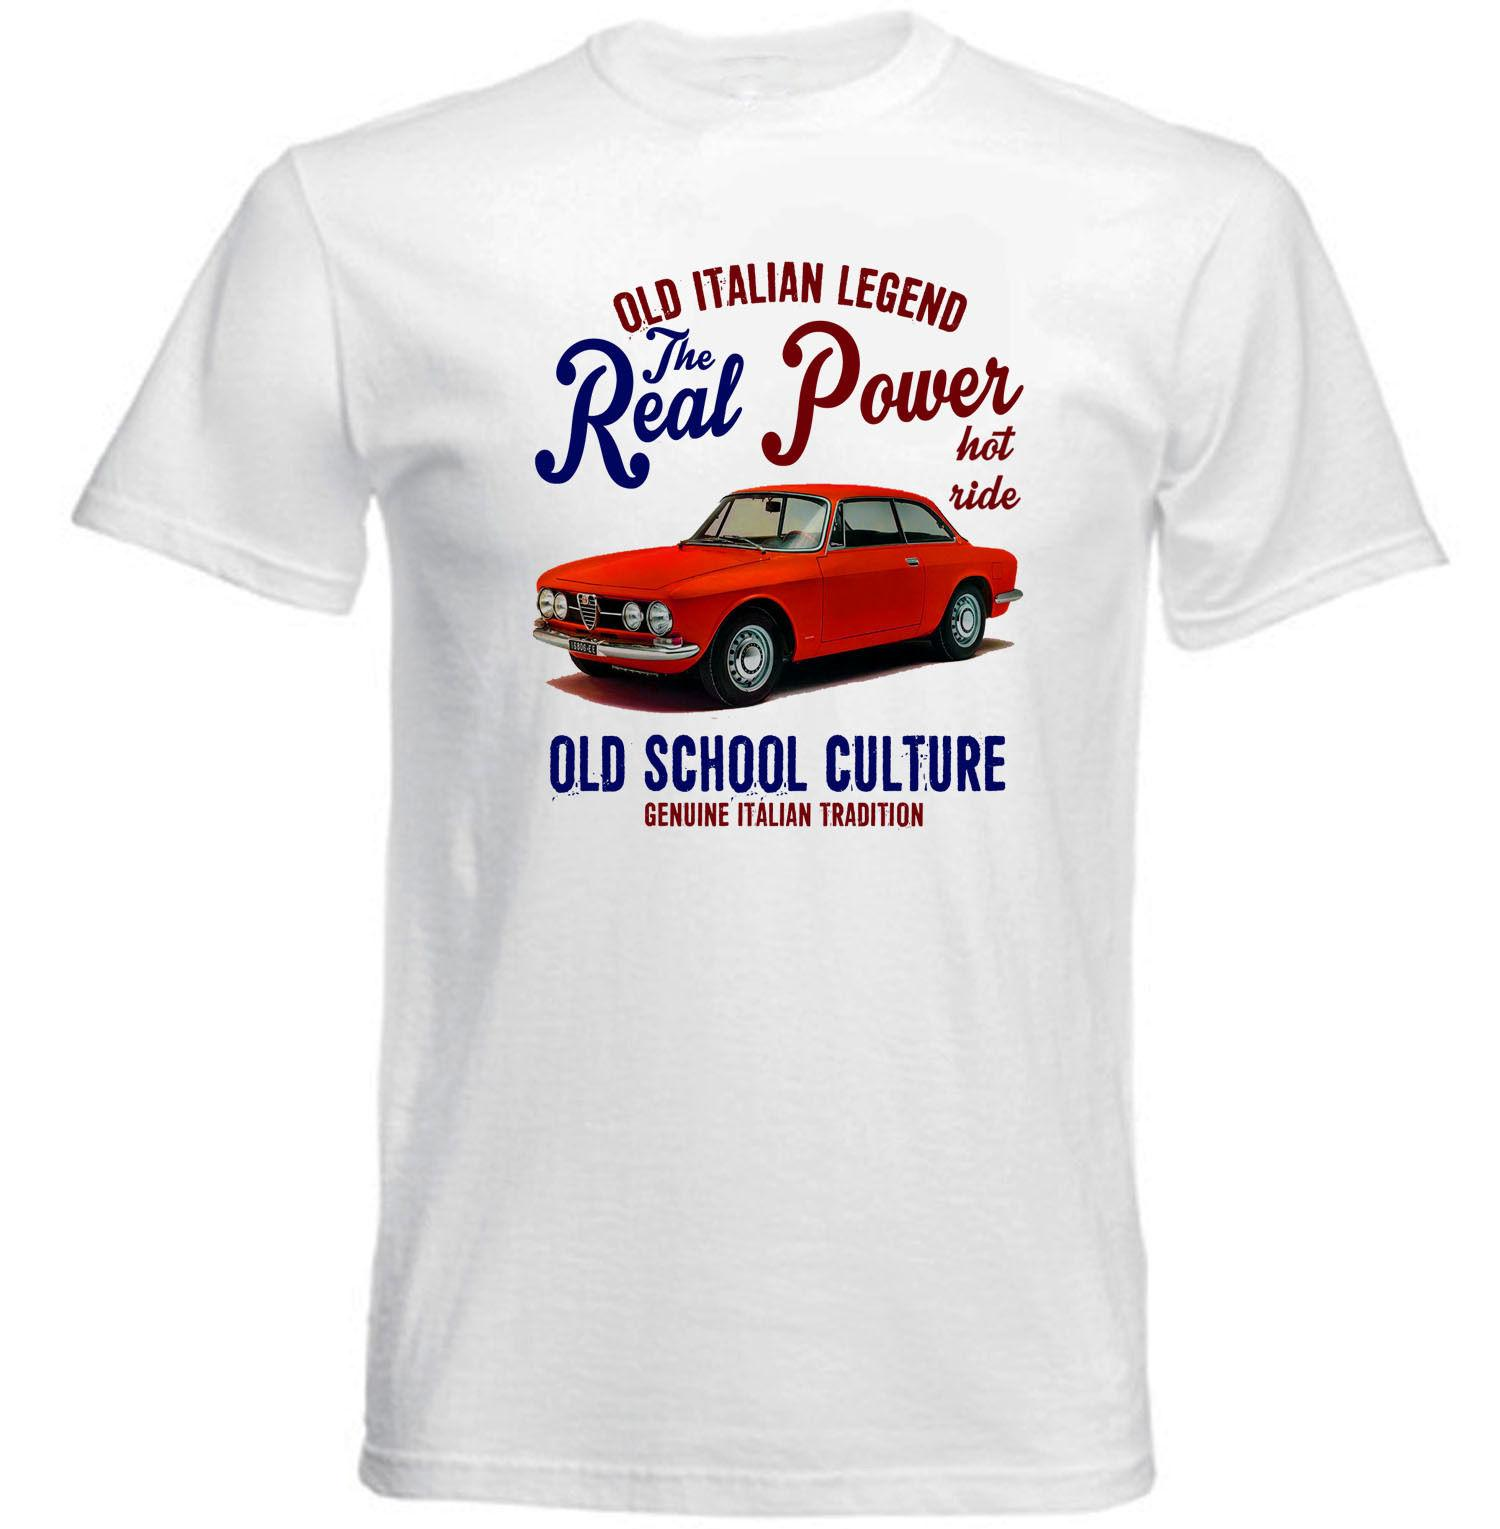 5b404836808 VINTAGE ITALIAN CAR ALFA ROMEO GIULIA SPRINT REAL POWER NEW COTTON T SHIRT  T Shirt Hot Sale O Neck Tee Shirt Cool Tshirt Designs Create T Shirt From  ...